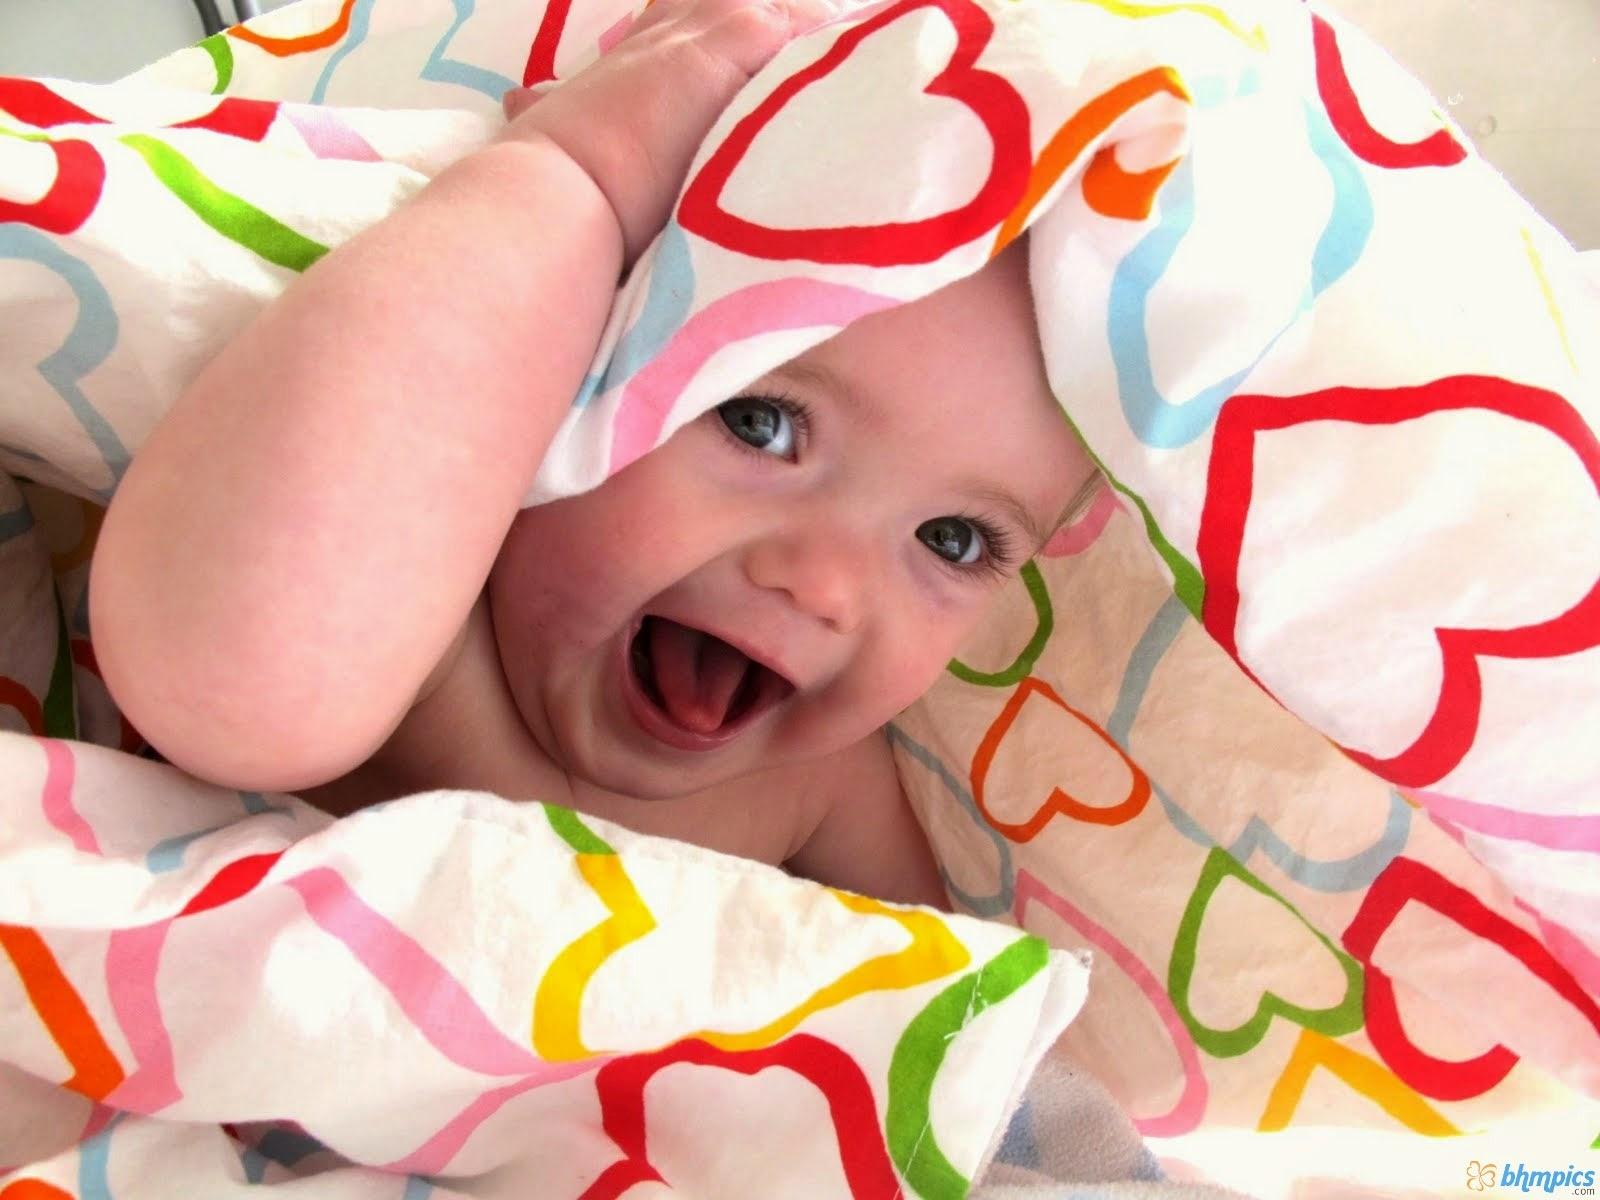 Ekspresi bayi paling lucu dan ceria